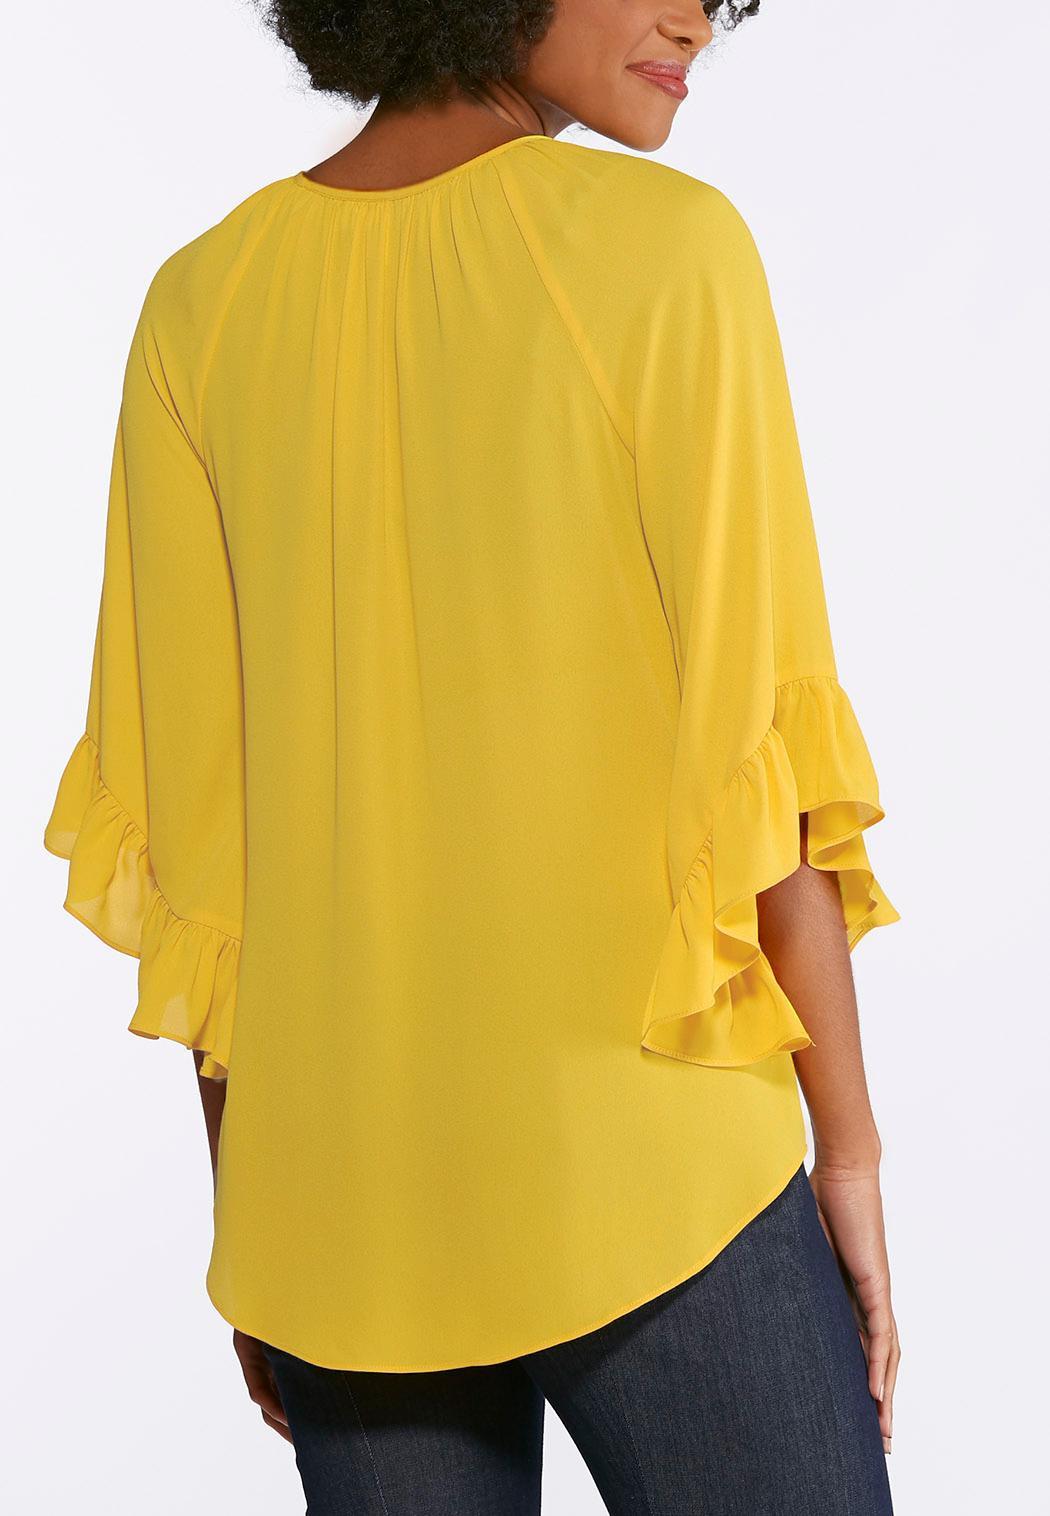 Breezy Ruffled Sleeve Top (Item #43743308)